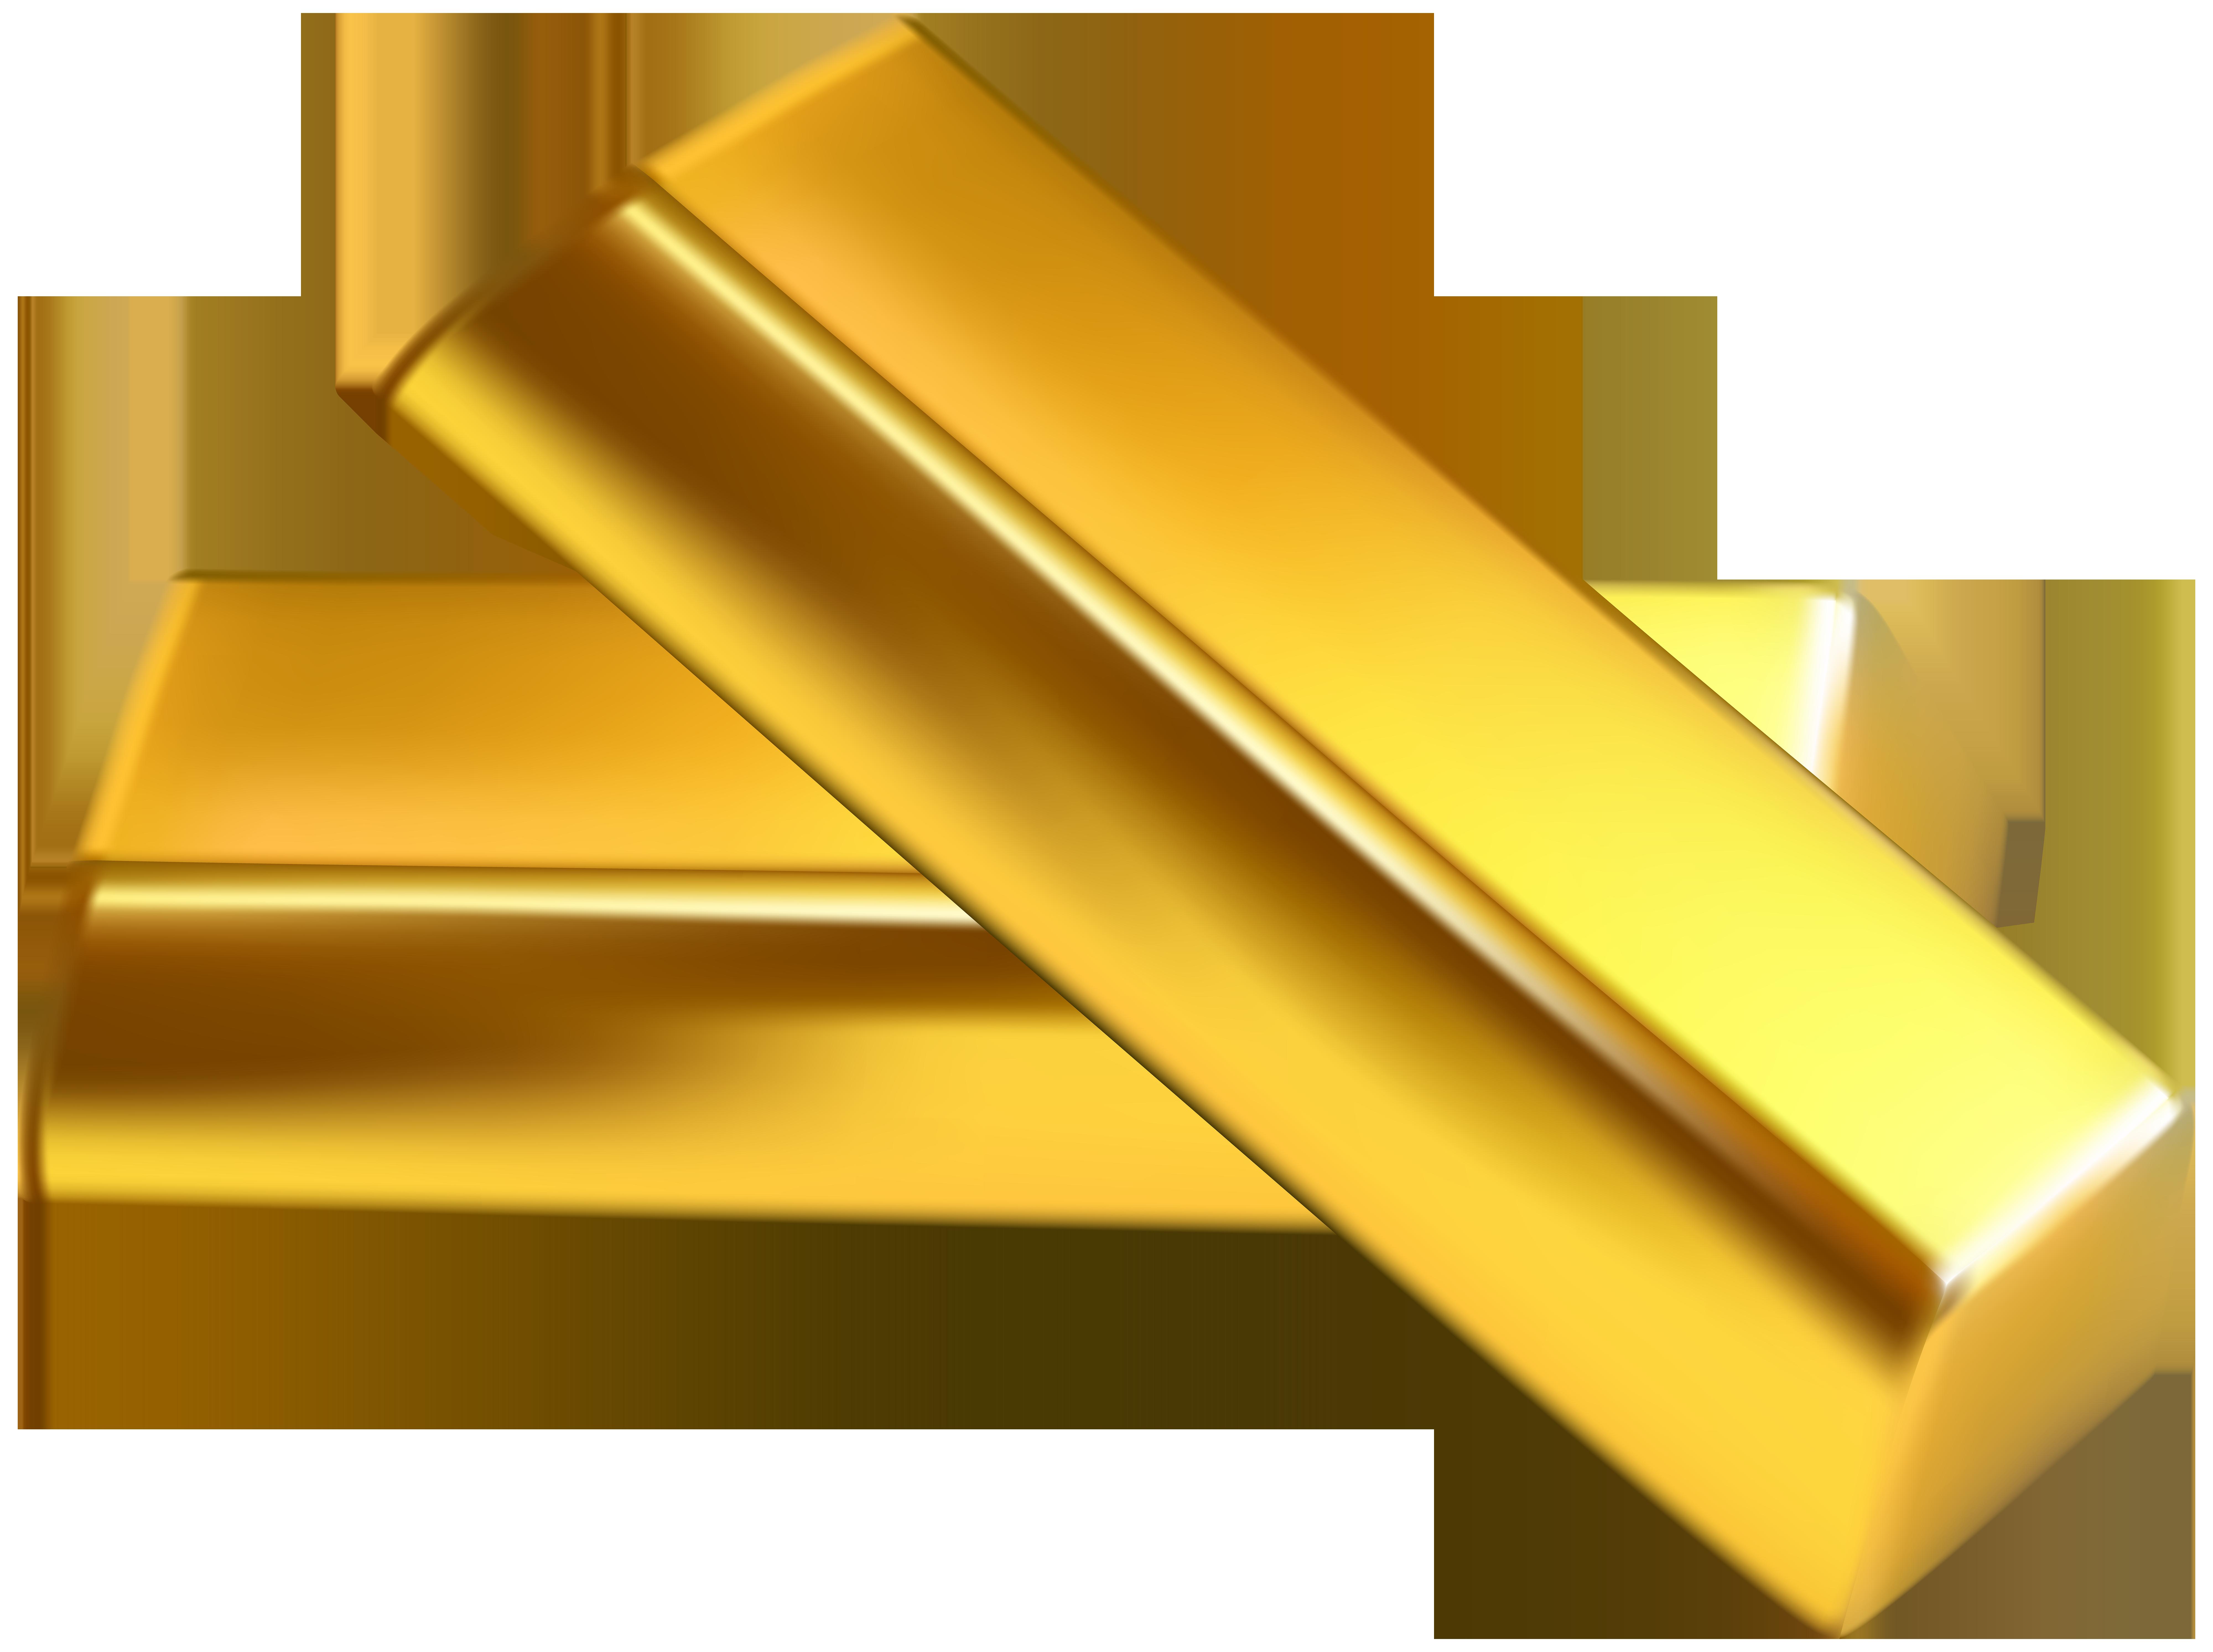 Transparent png clip art. Gold clipart gold bullion